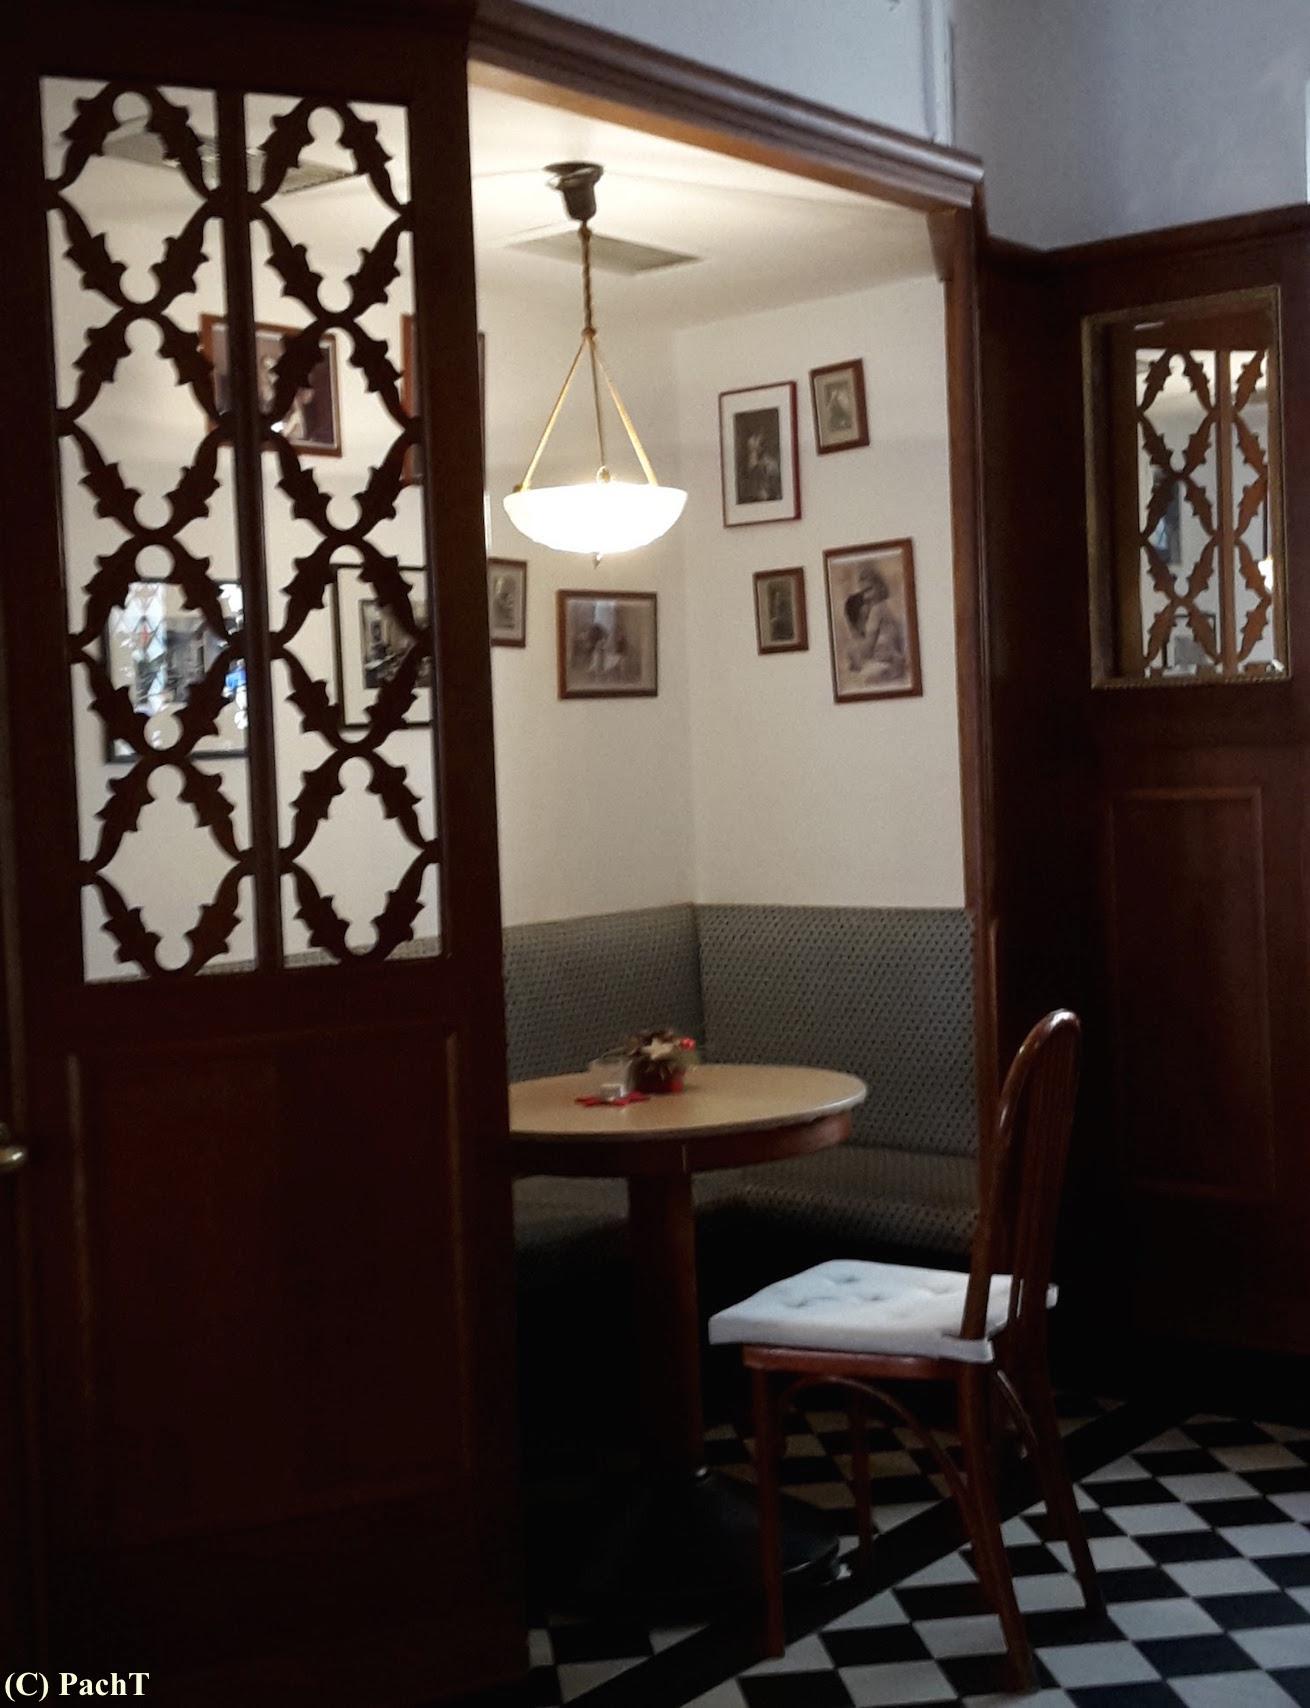 2017.12.22 Cafe Rommel EF 3